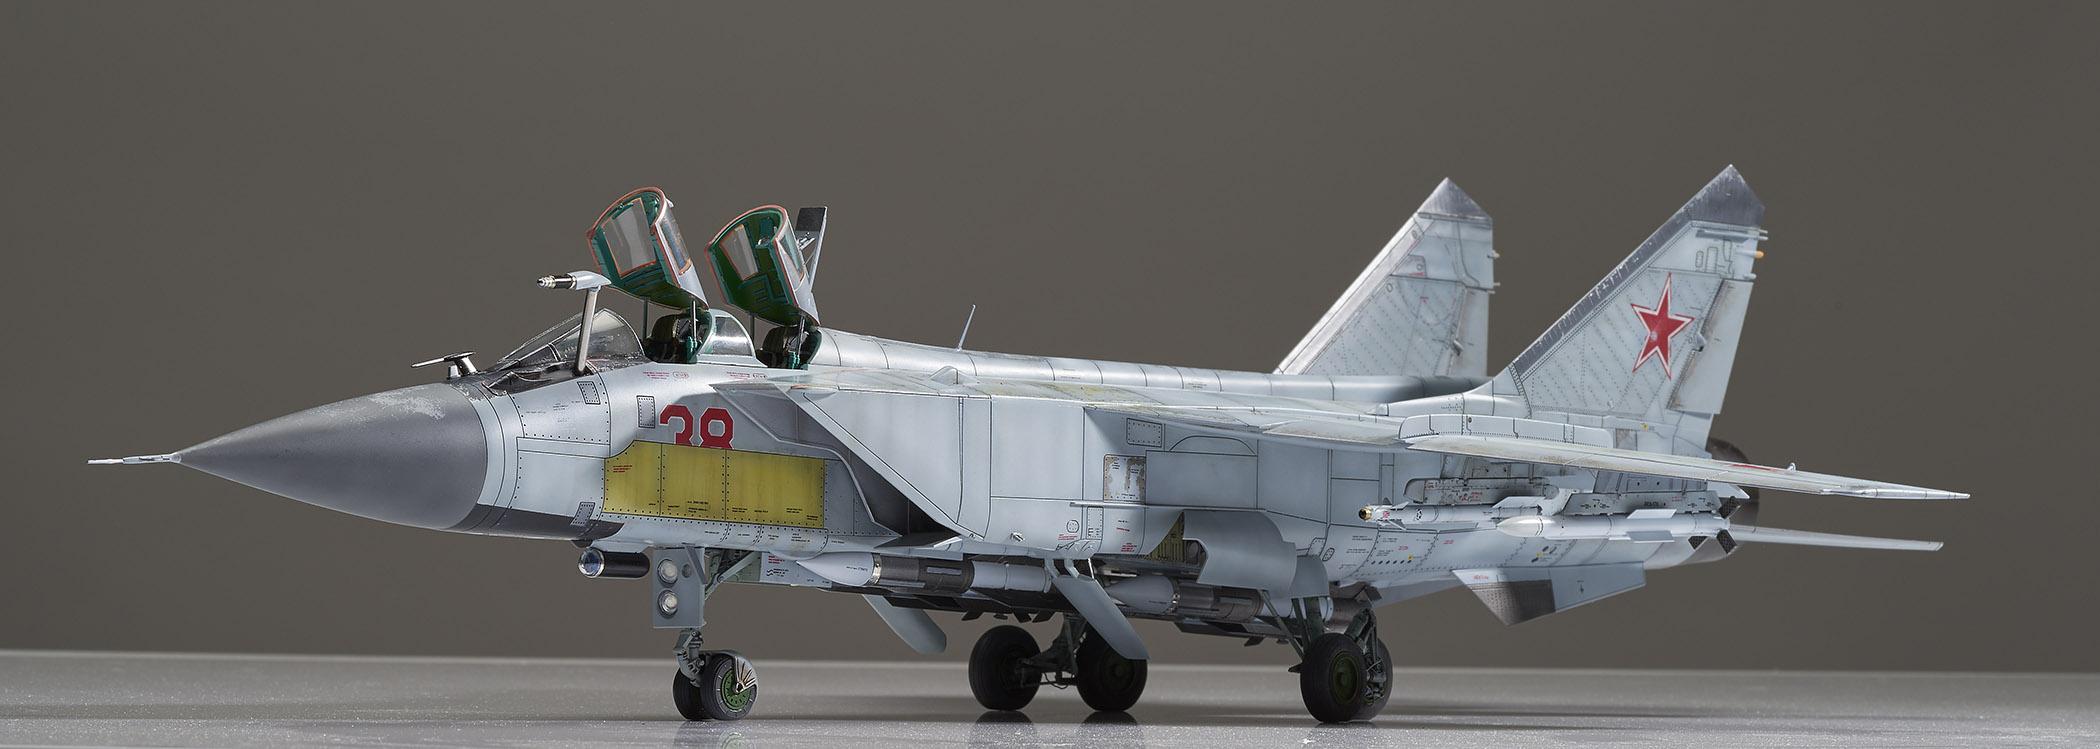 1/48 AMK MiG-31